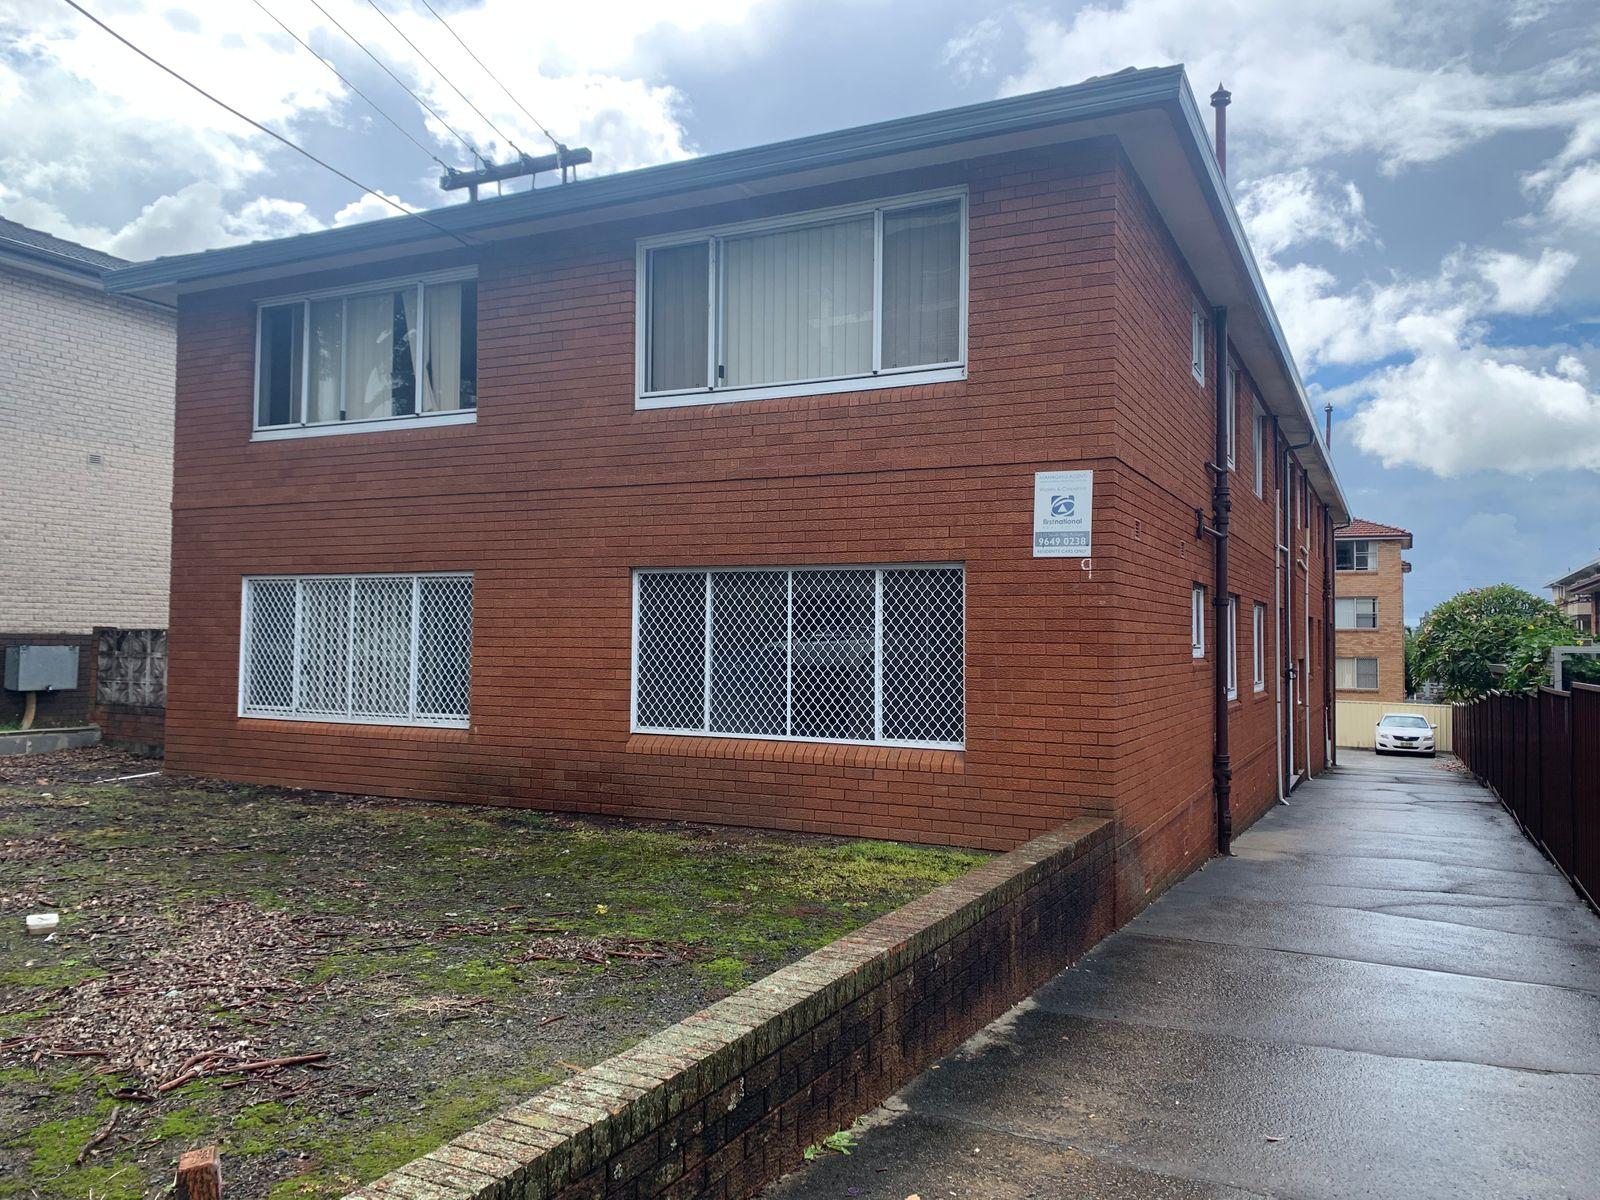 7/9 Queen Street, Auburn, NSW 2144